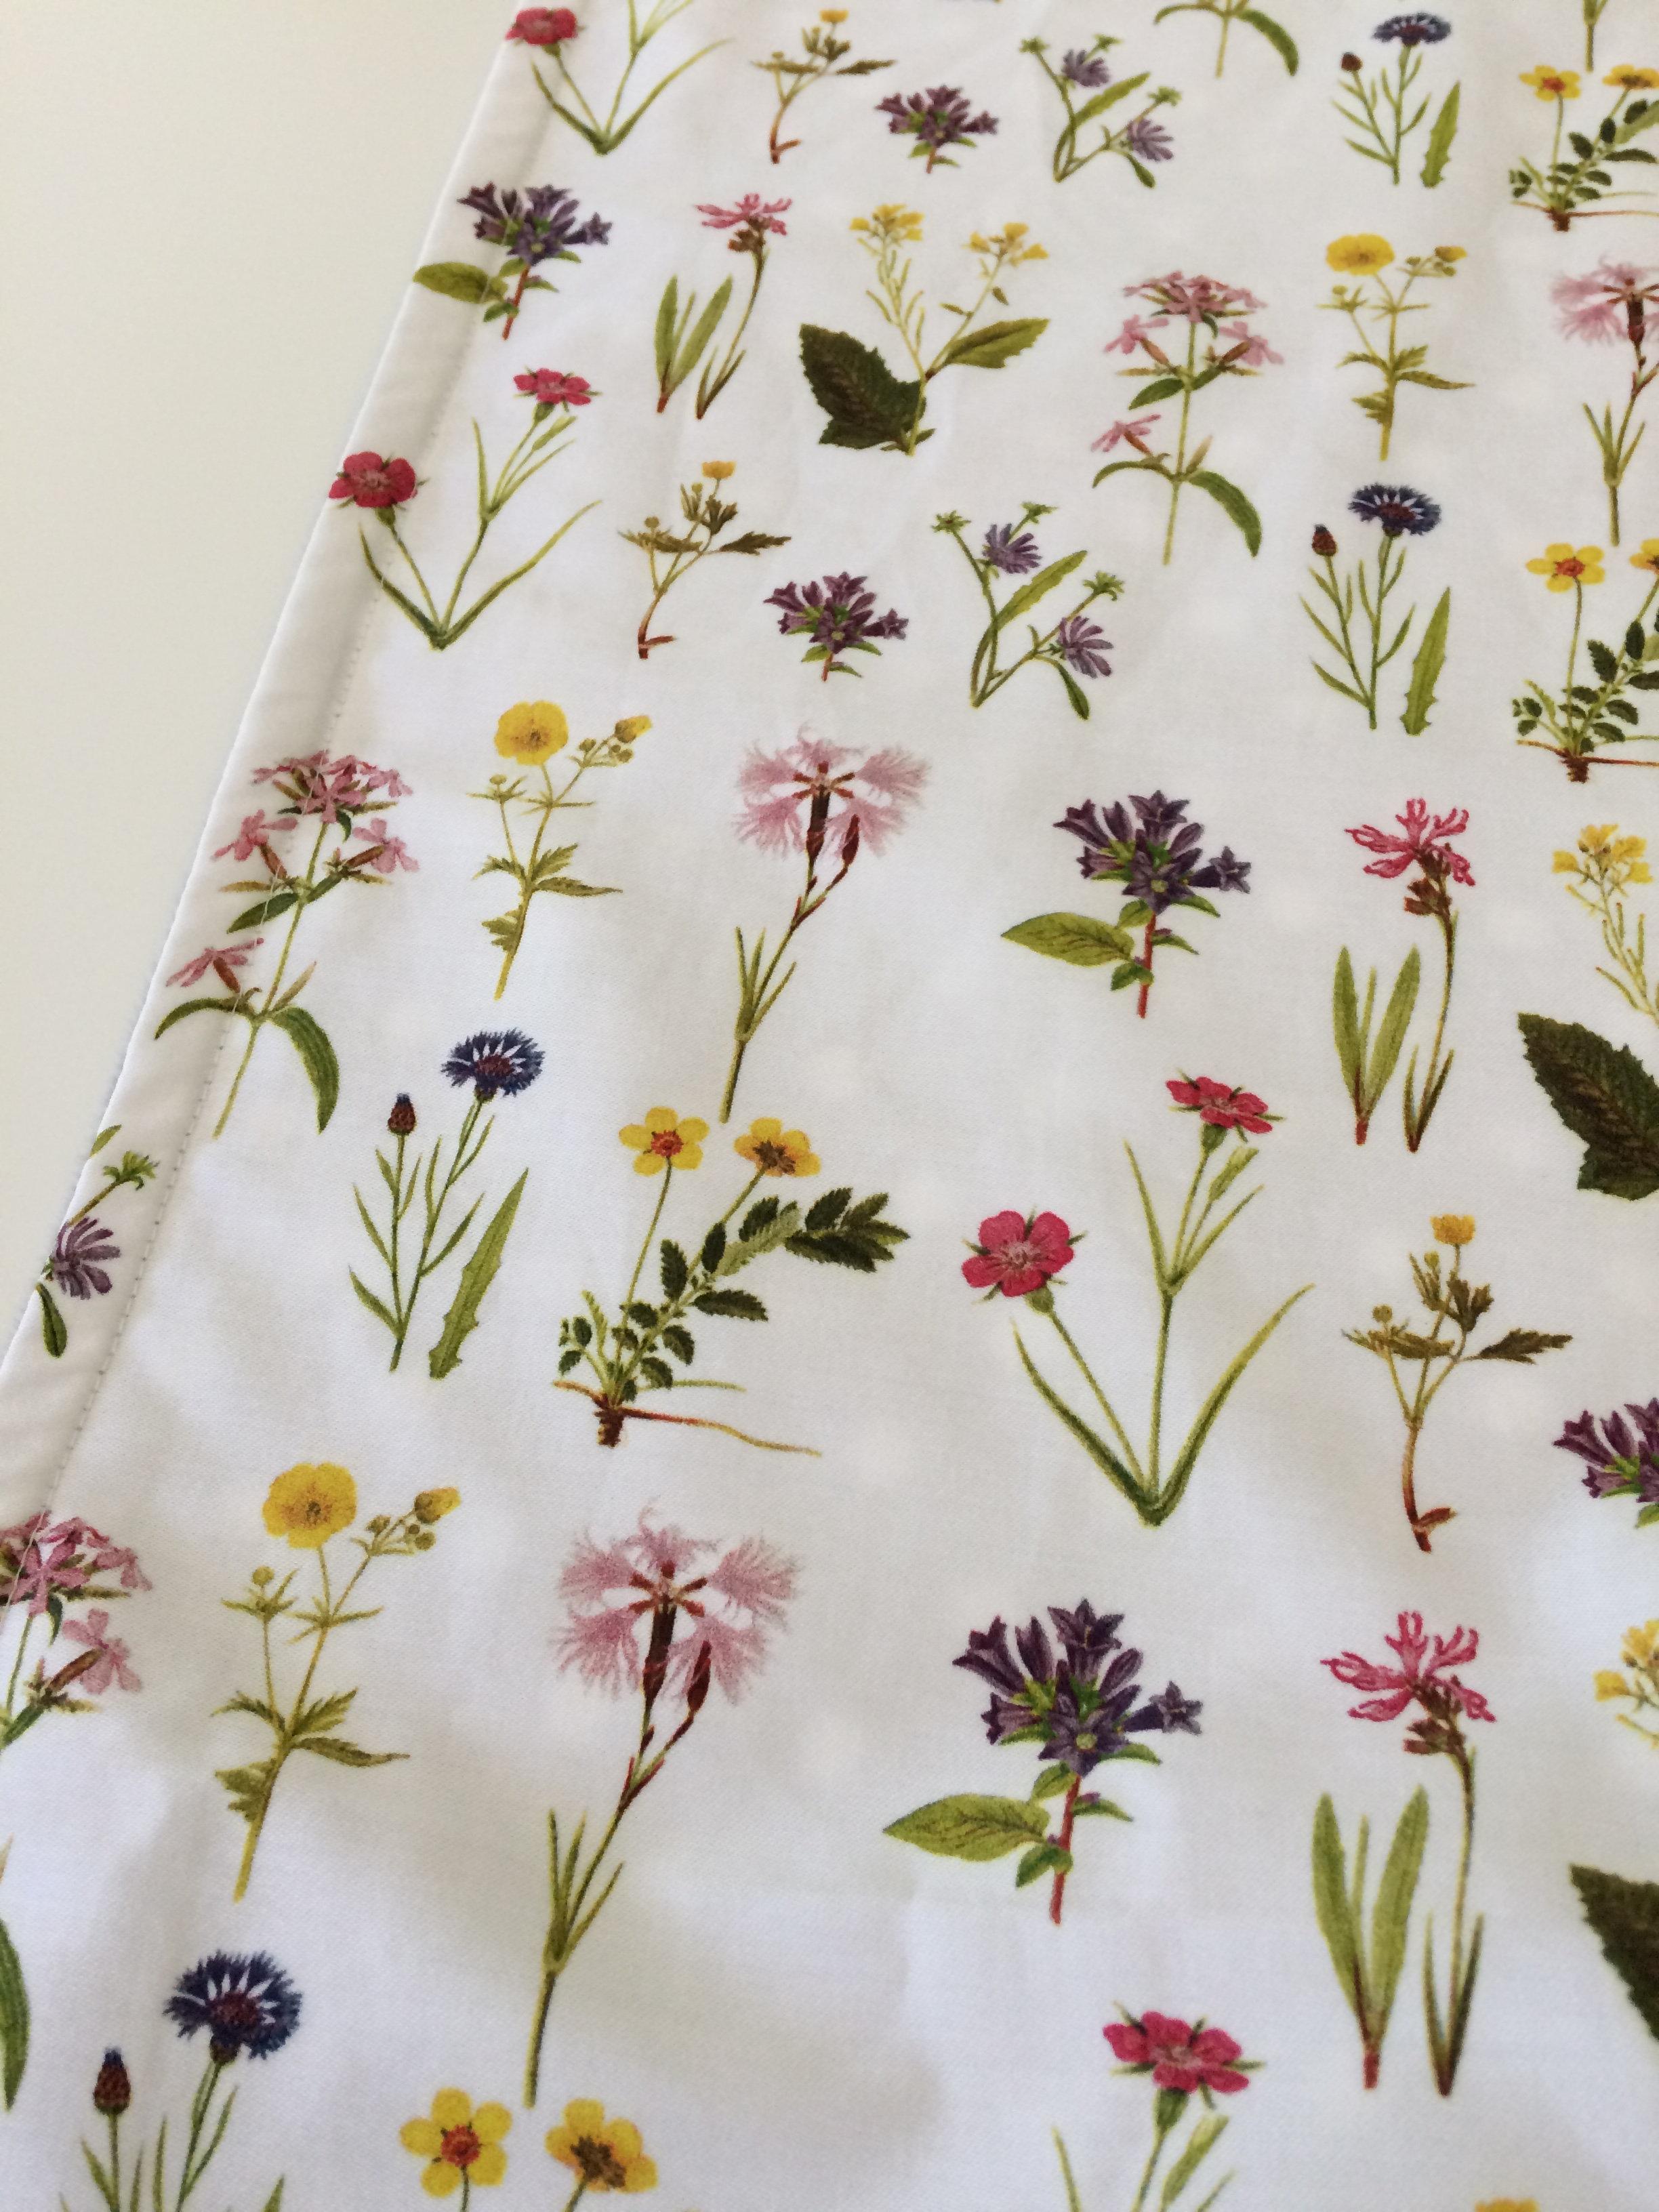 Organic Cotton Sateen, Minky Baby Blanket - Wildflowers   Ready to Ship